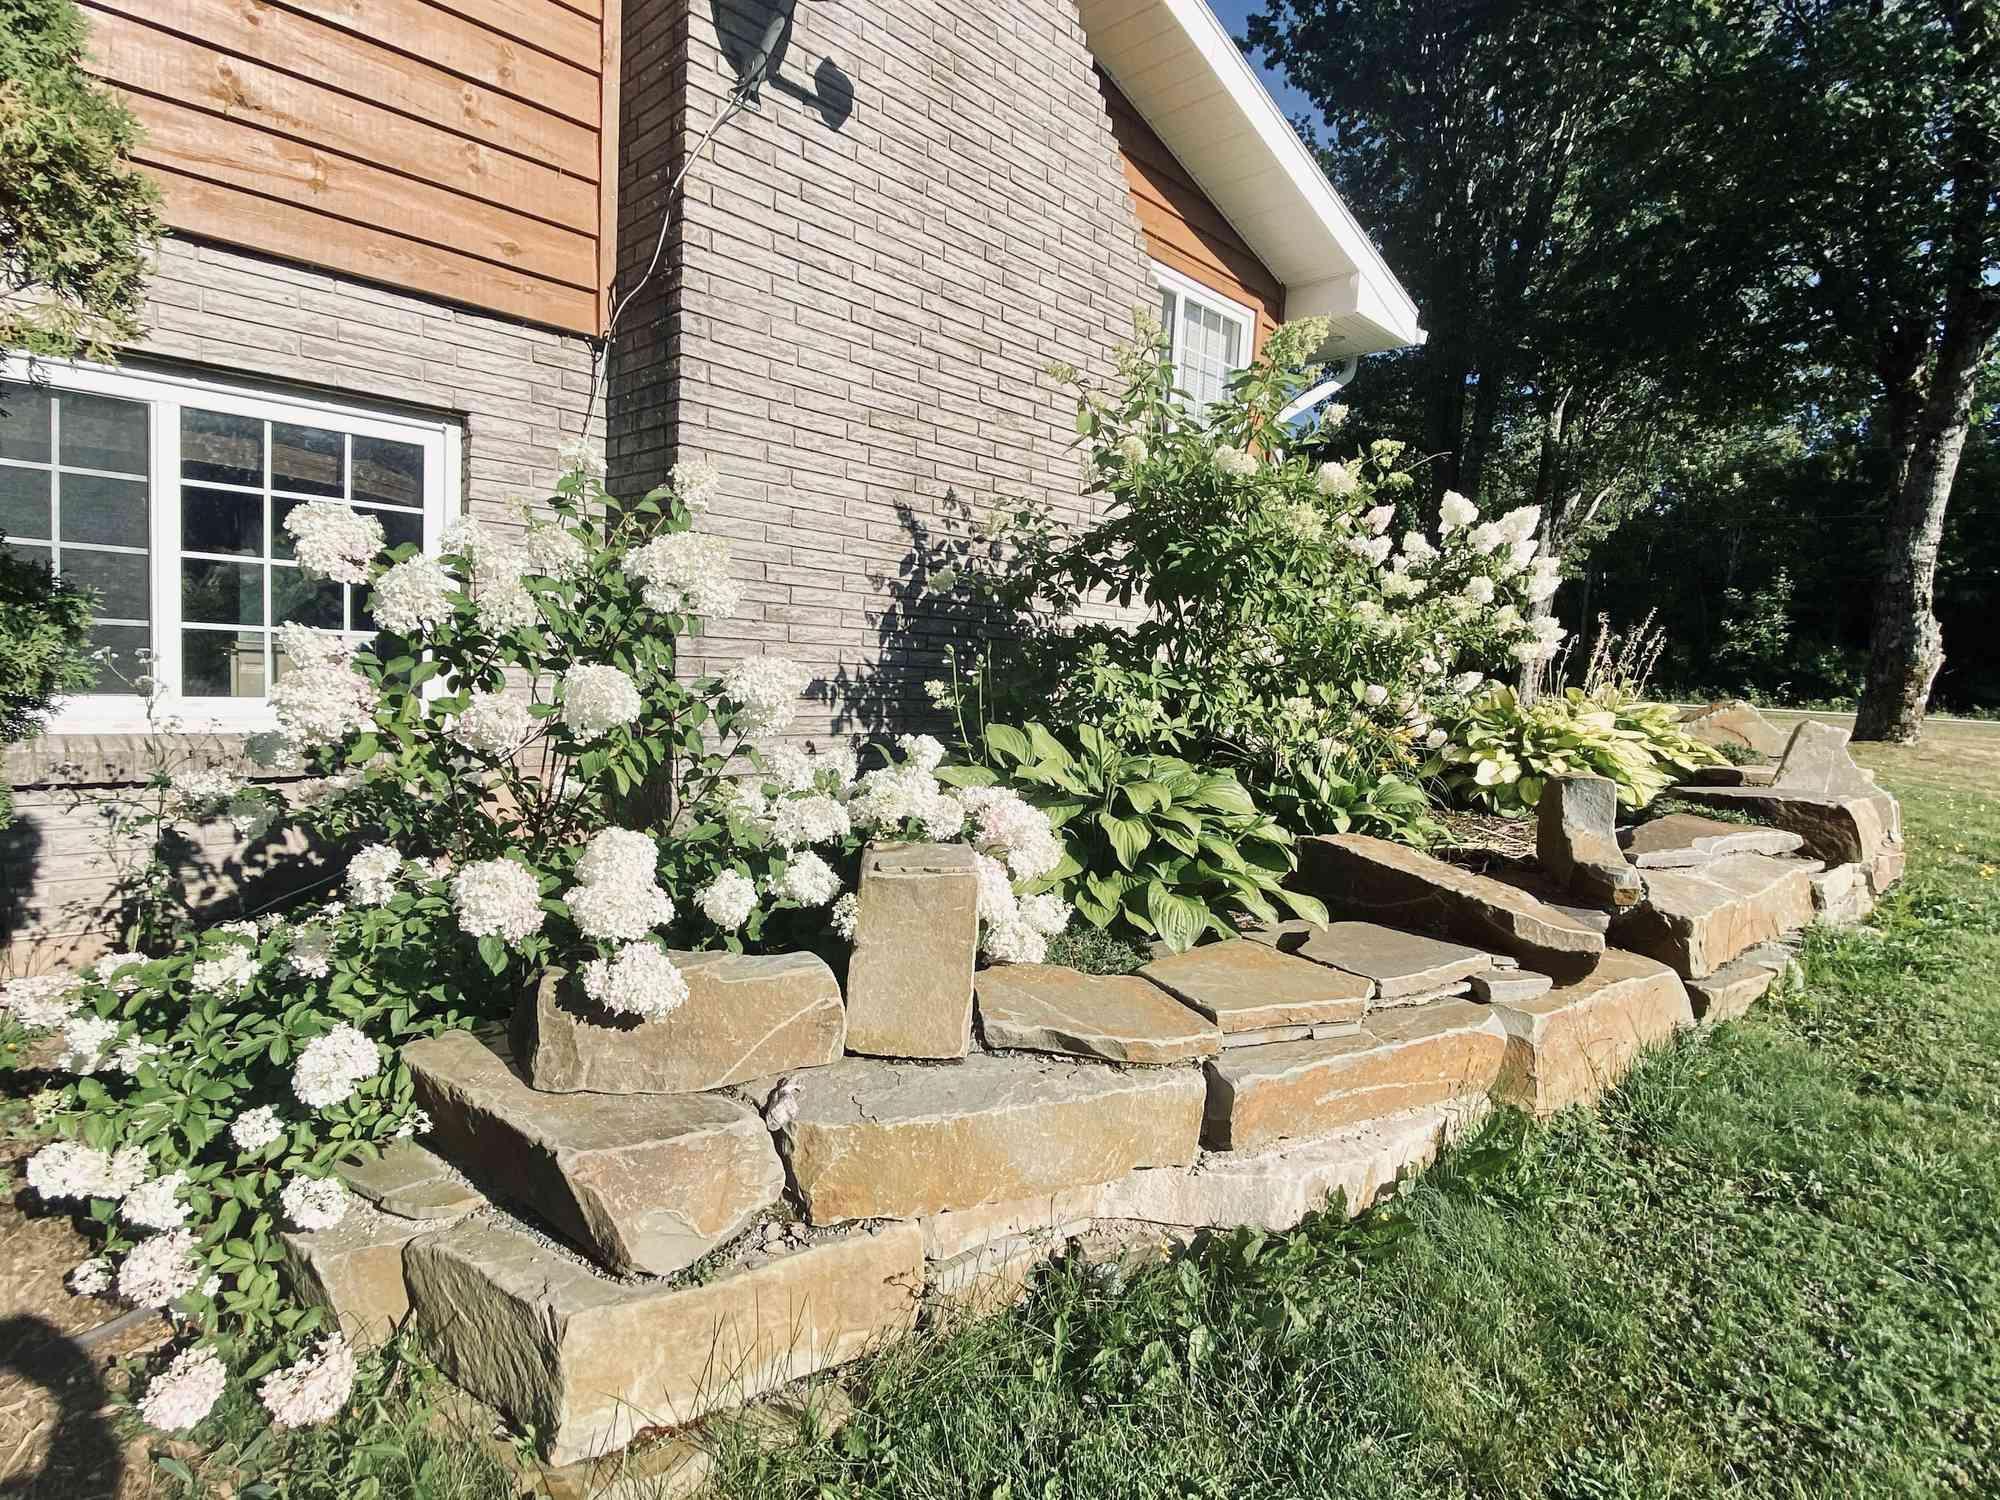 Cottage flower bed with hydrangeas.